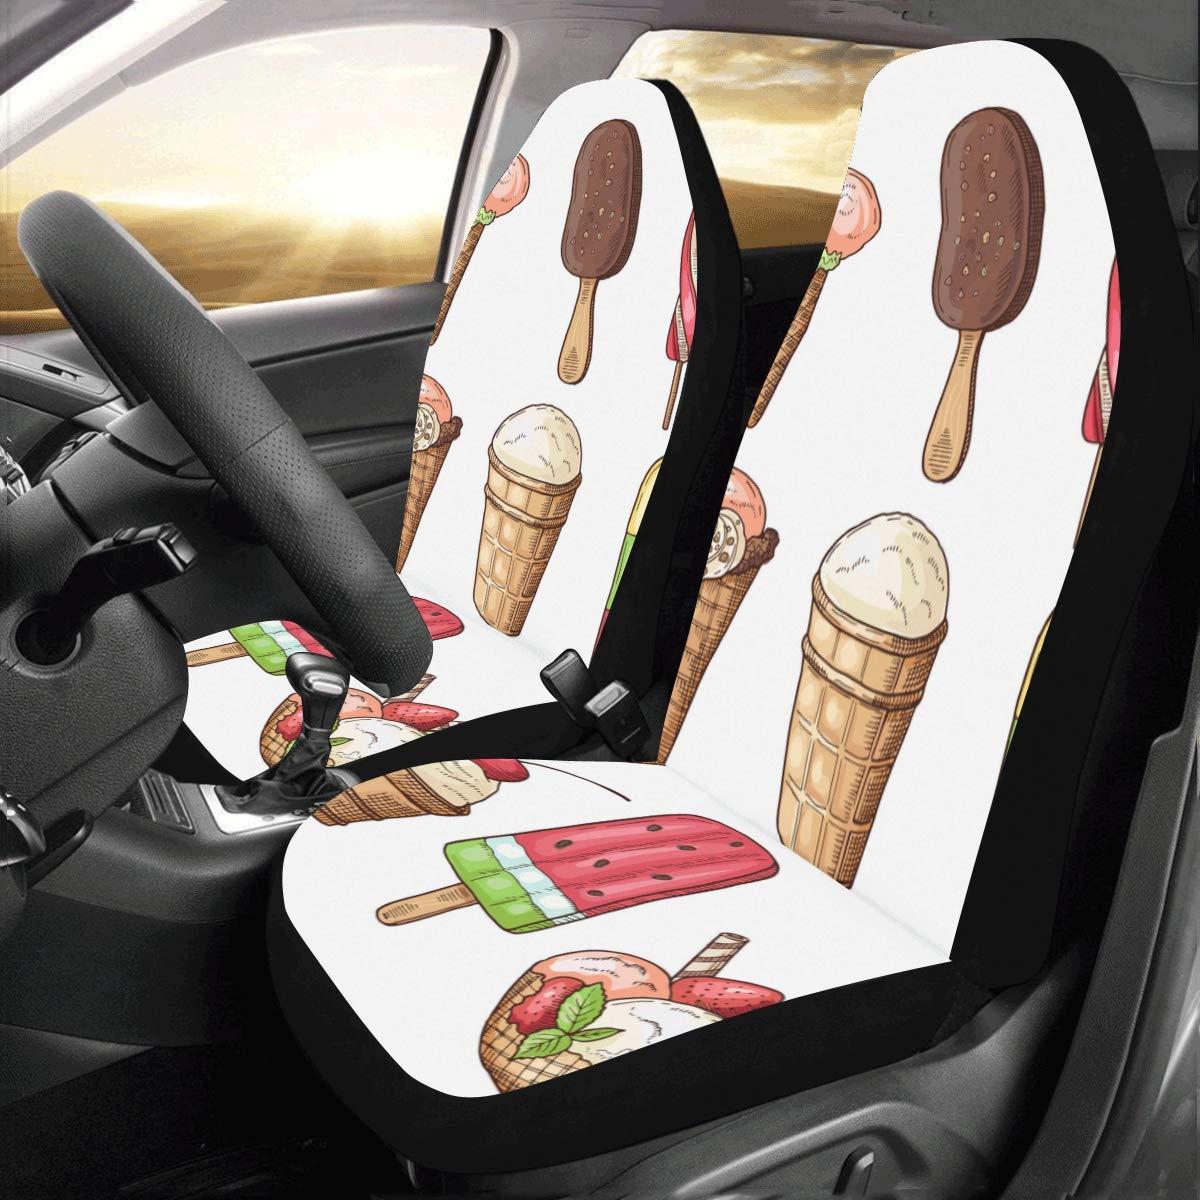 Amazon.com: Verano Tasty helado dibujos animados ...